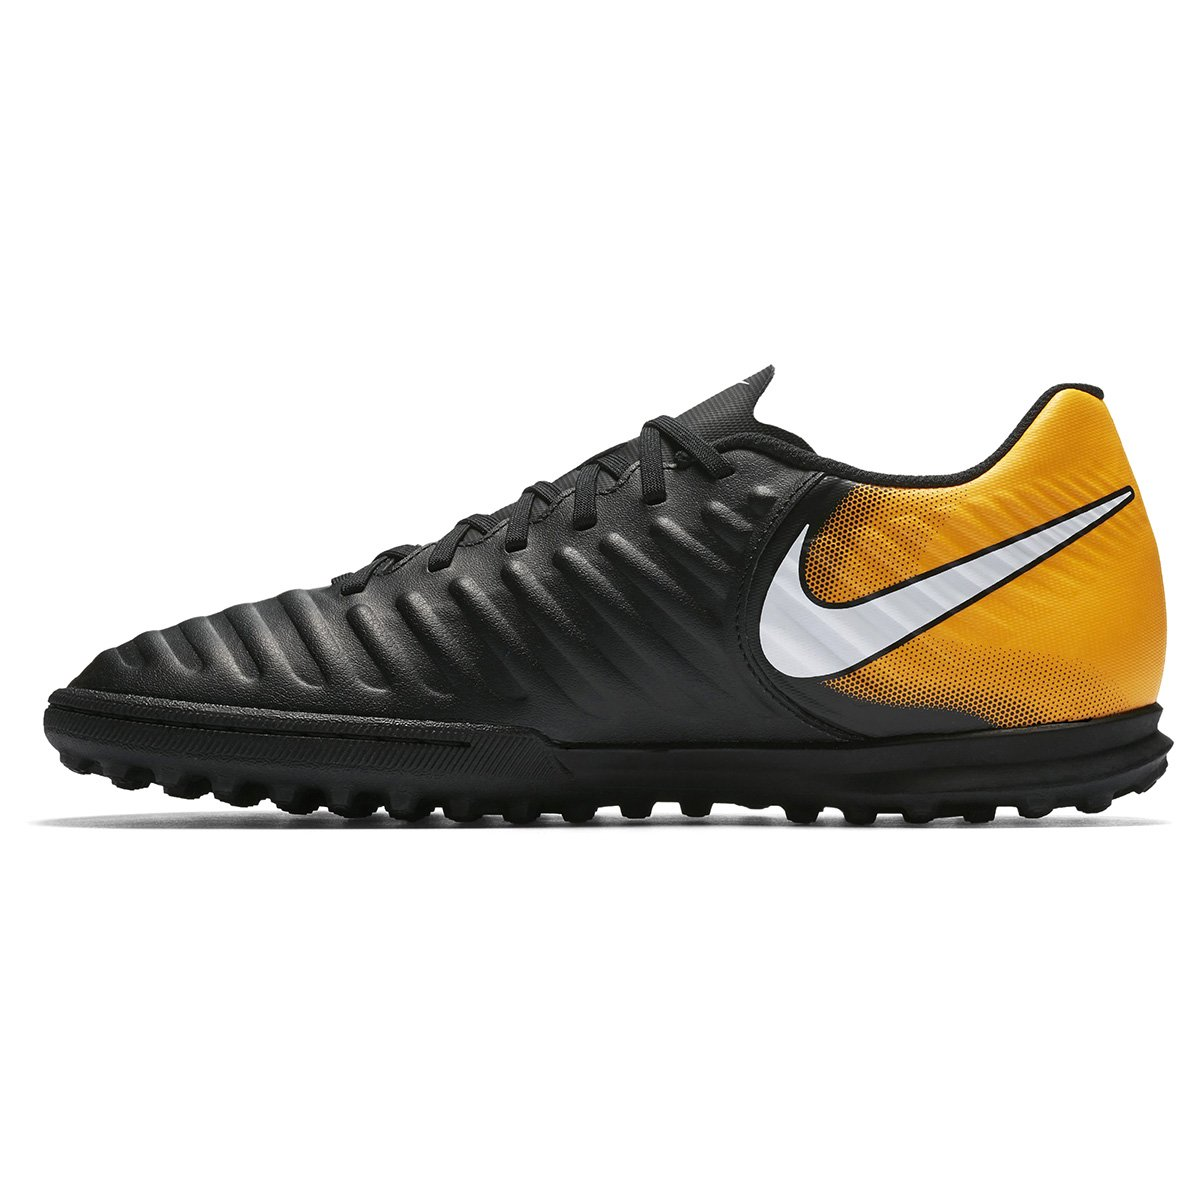 Chuteira Society Nike Tiempo Rio 4 TF - Preto e Laranja - Compre ... e0a0171d29bdc